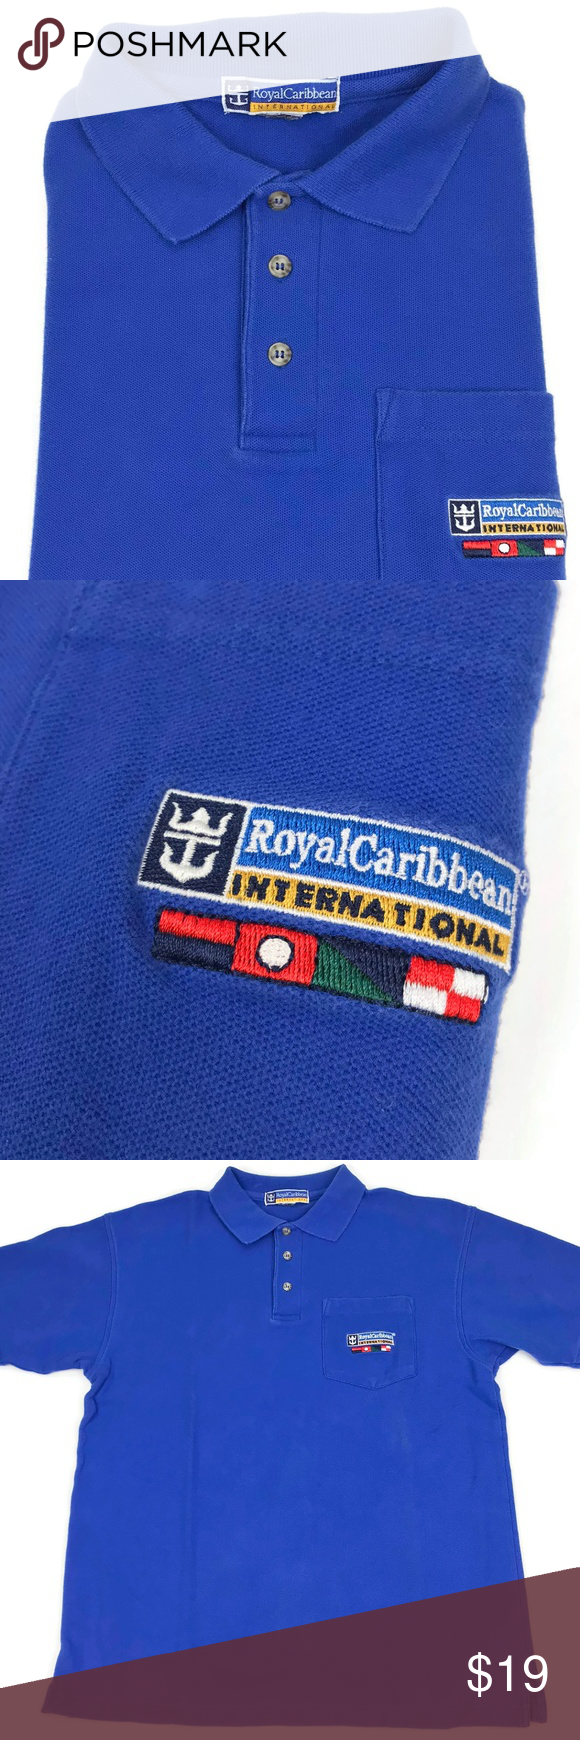 Royal Caribbean Polo Shirt Men's Size Small Medium (With